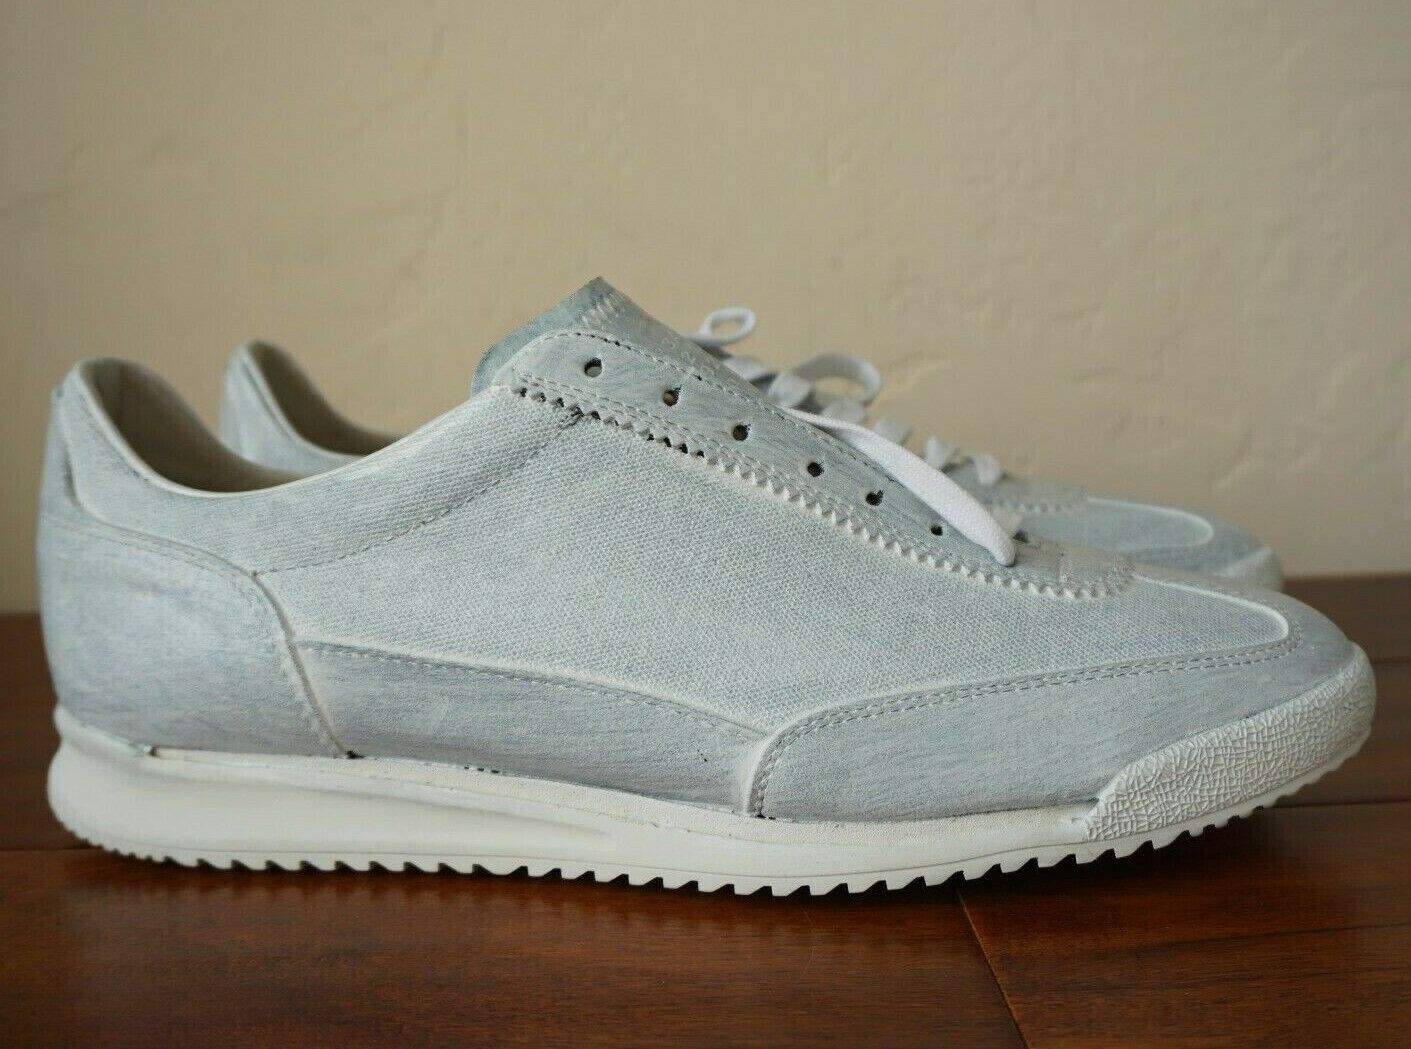 NEW WITH BOX   MAISON MARTIN MARGIELA US 12 45 PAINT PAINTED bianca nero scarpe da ginnastica